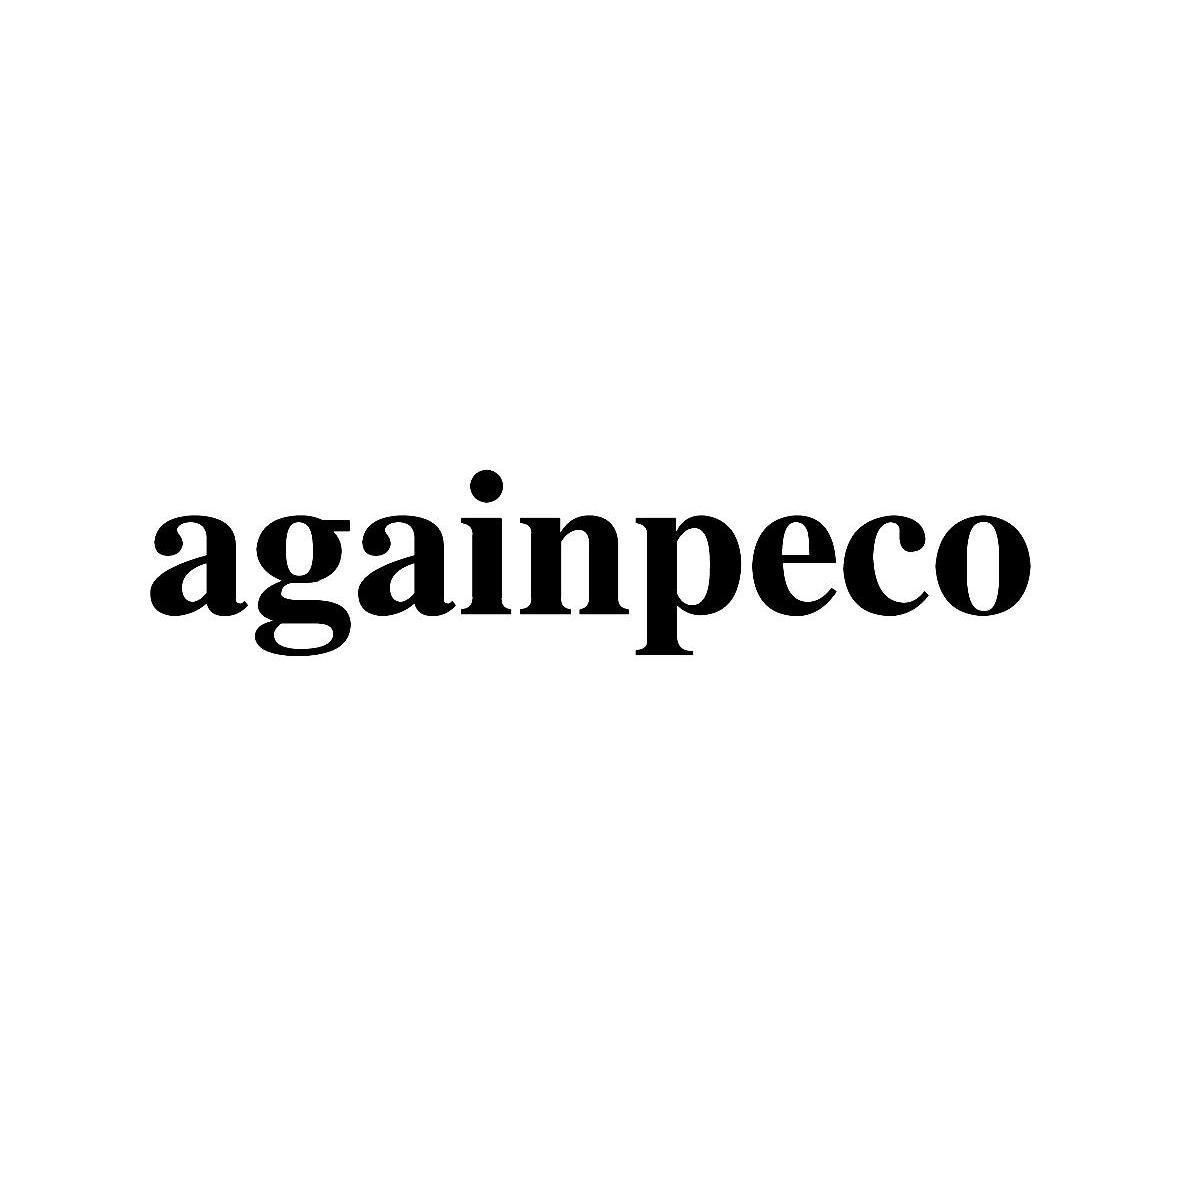 AGAINPECO